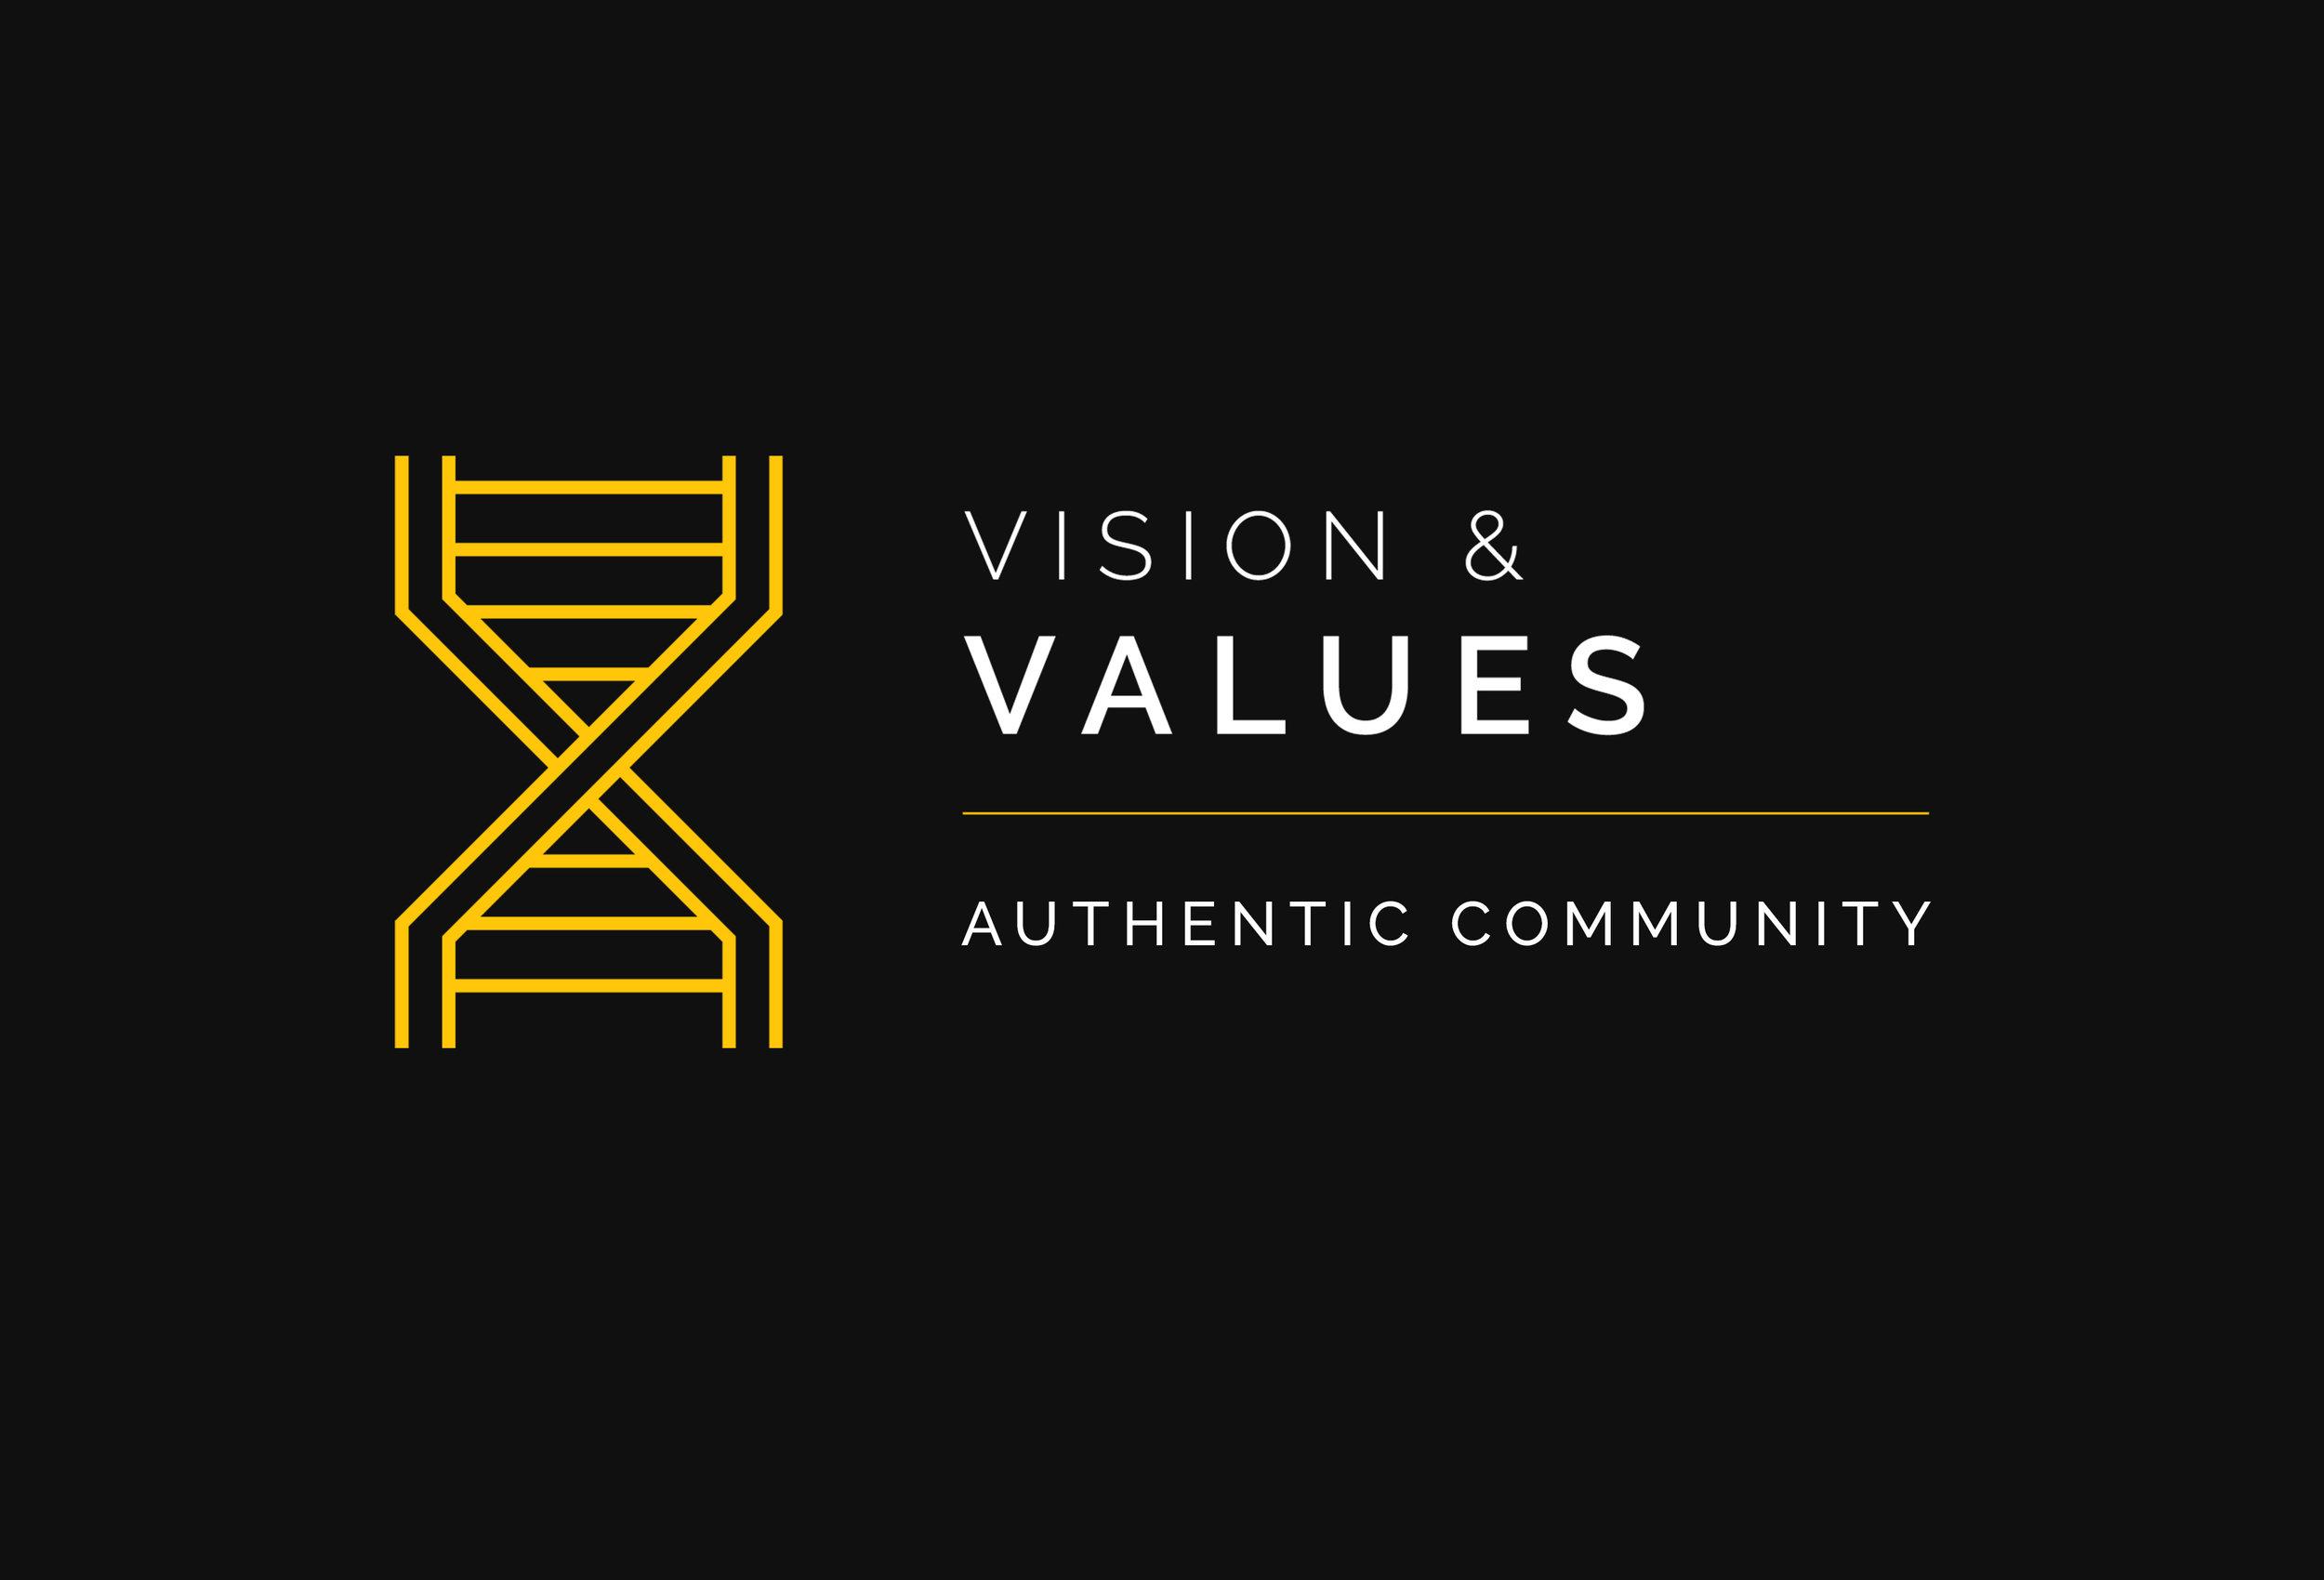 VisionValues-AuthenticCommunity.jpg